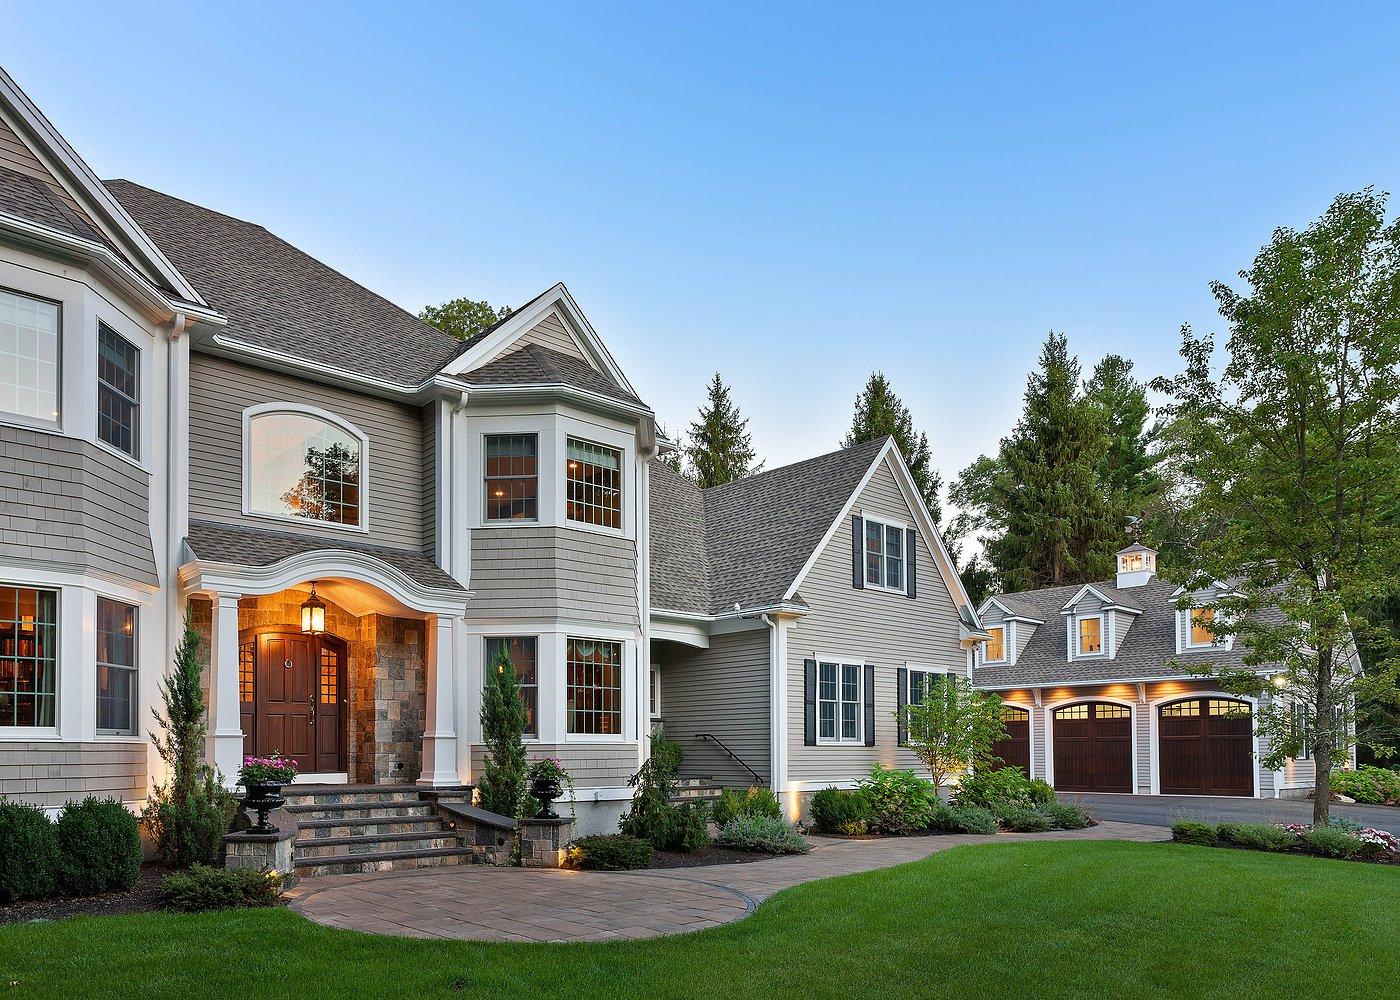 suburban-retreat-medfield-ma-8